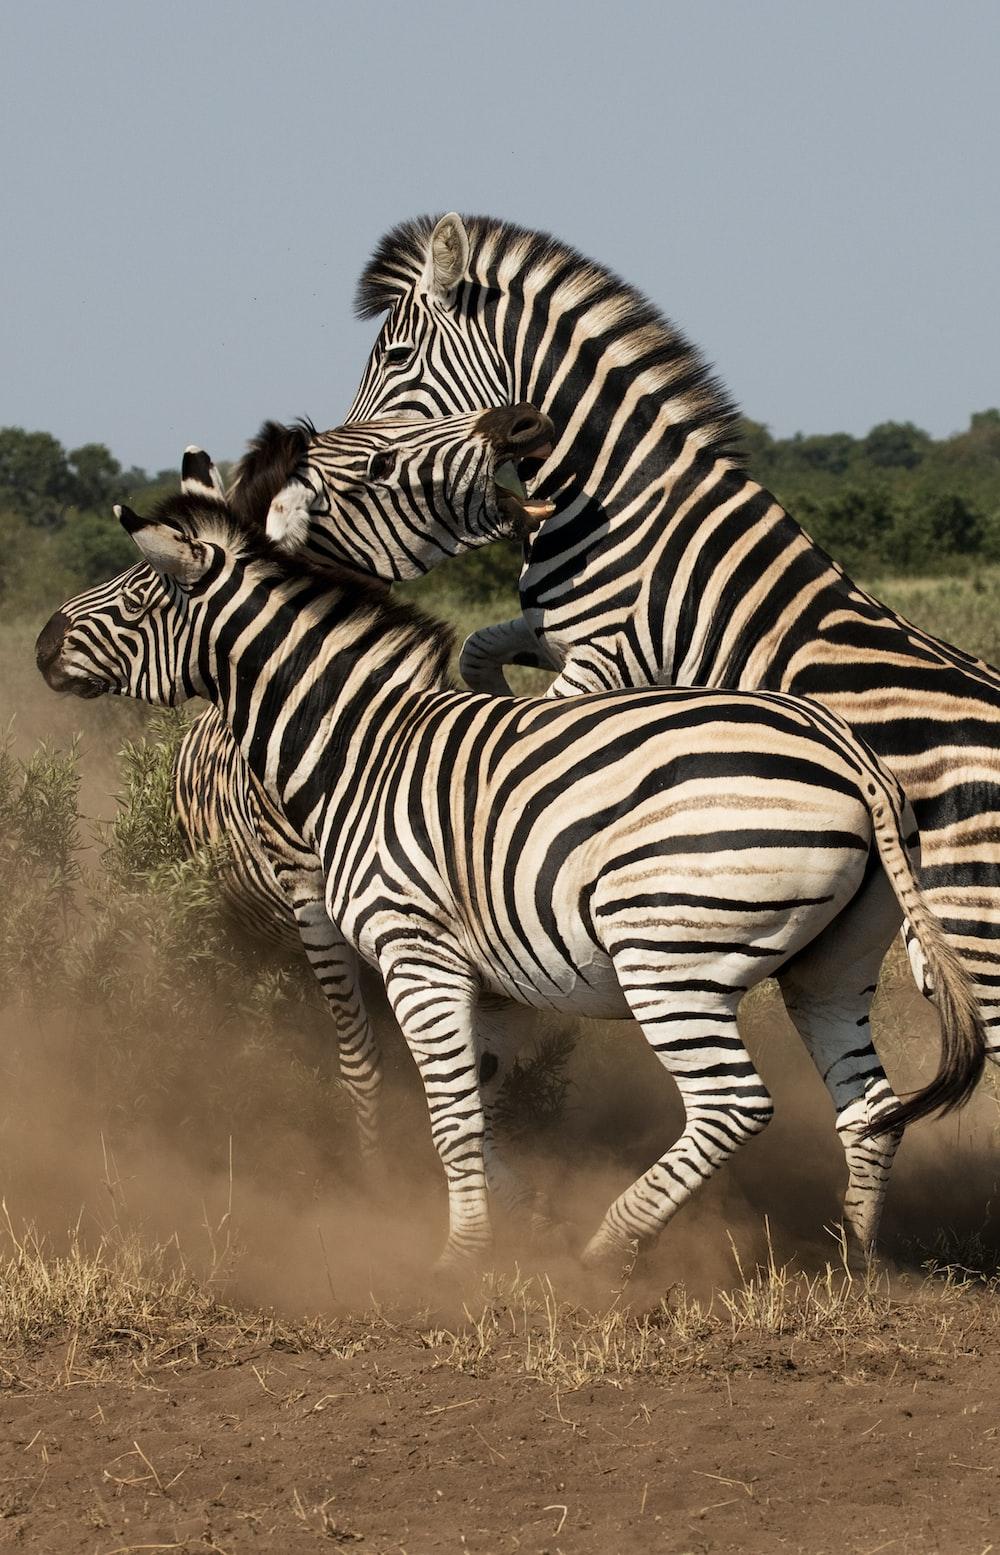 three black-and-white zebras